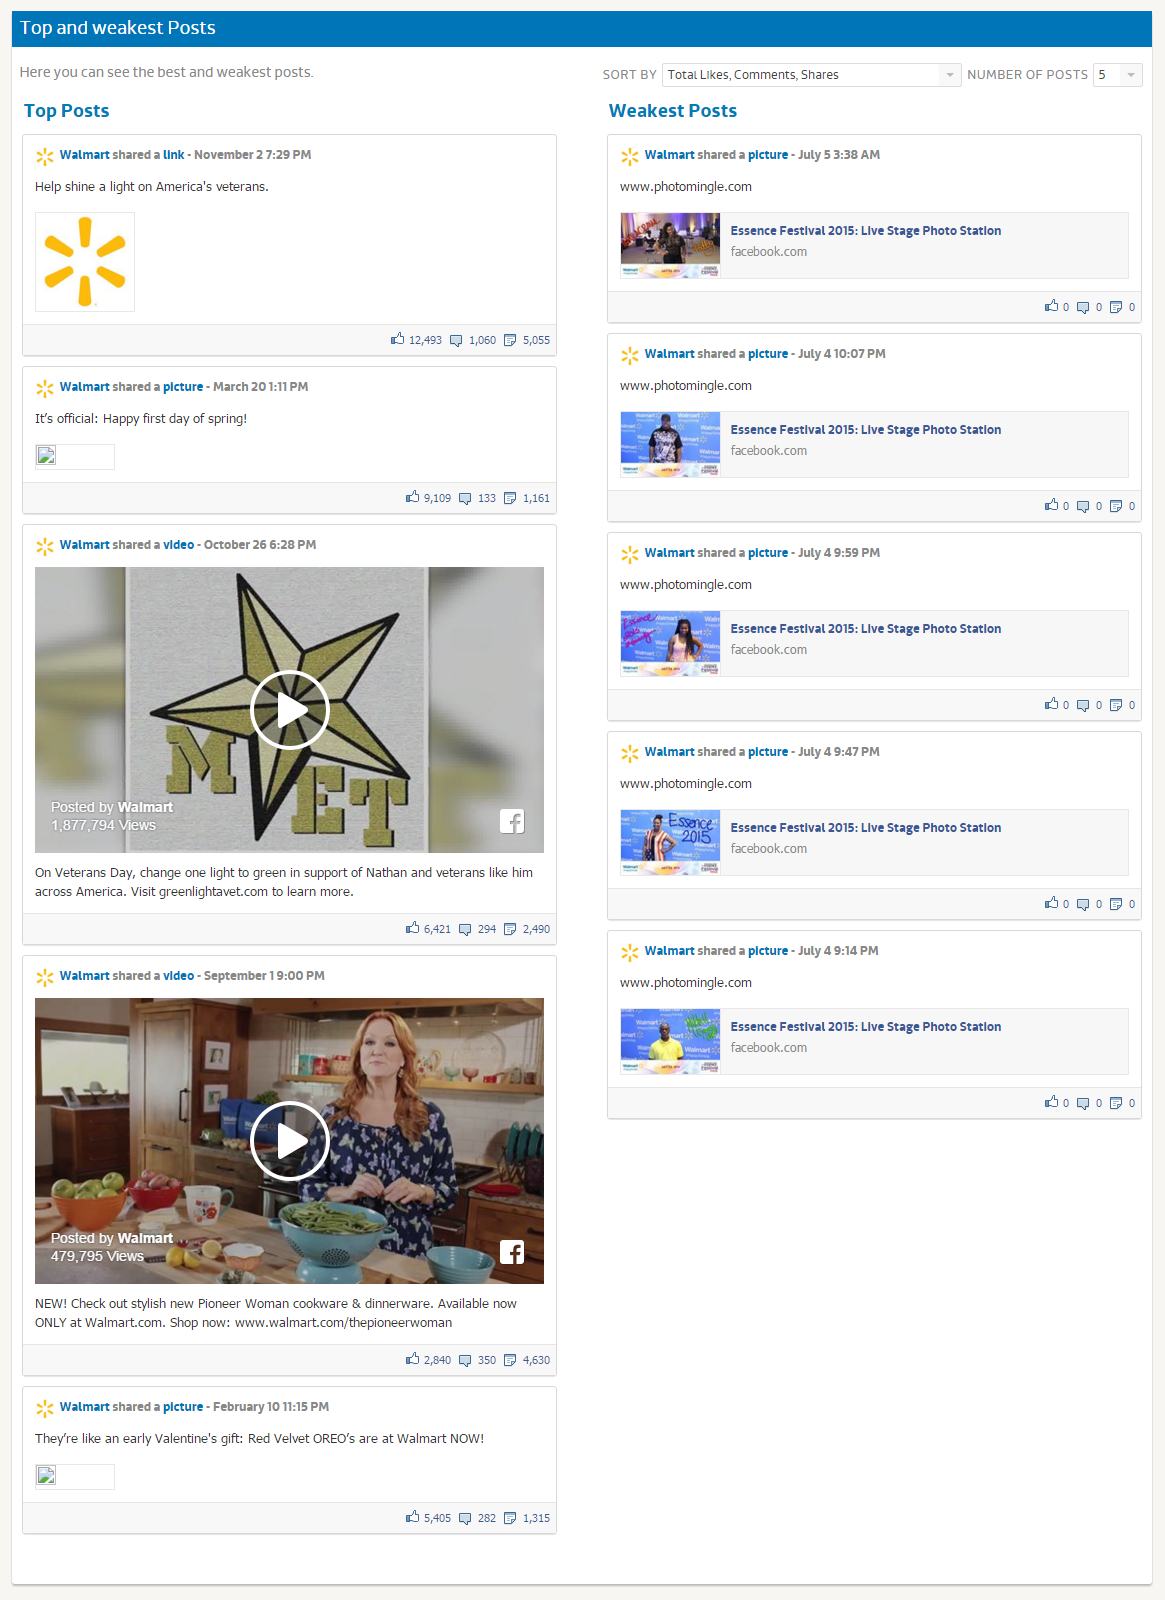 Media Research - Walmart on FB (3)